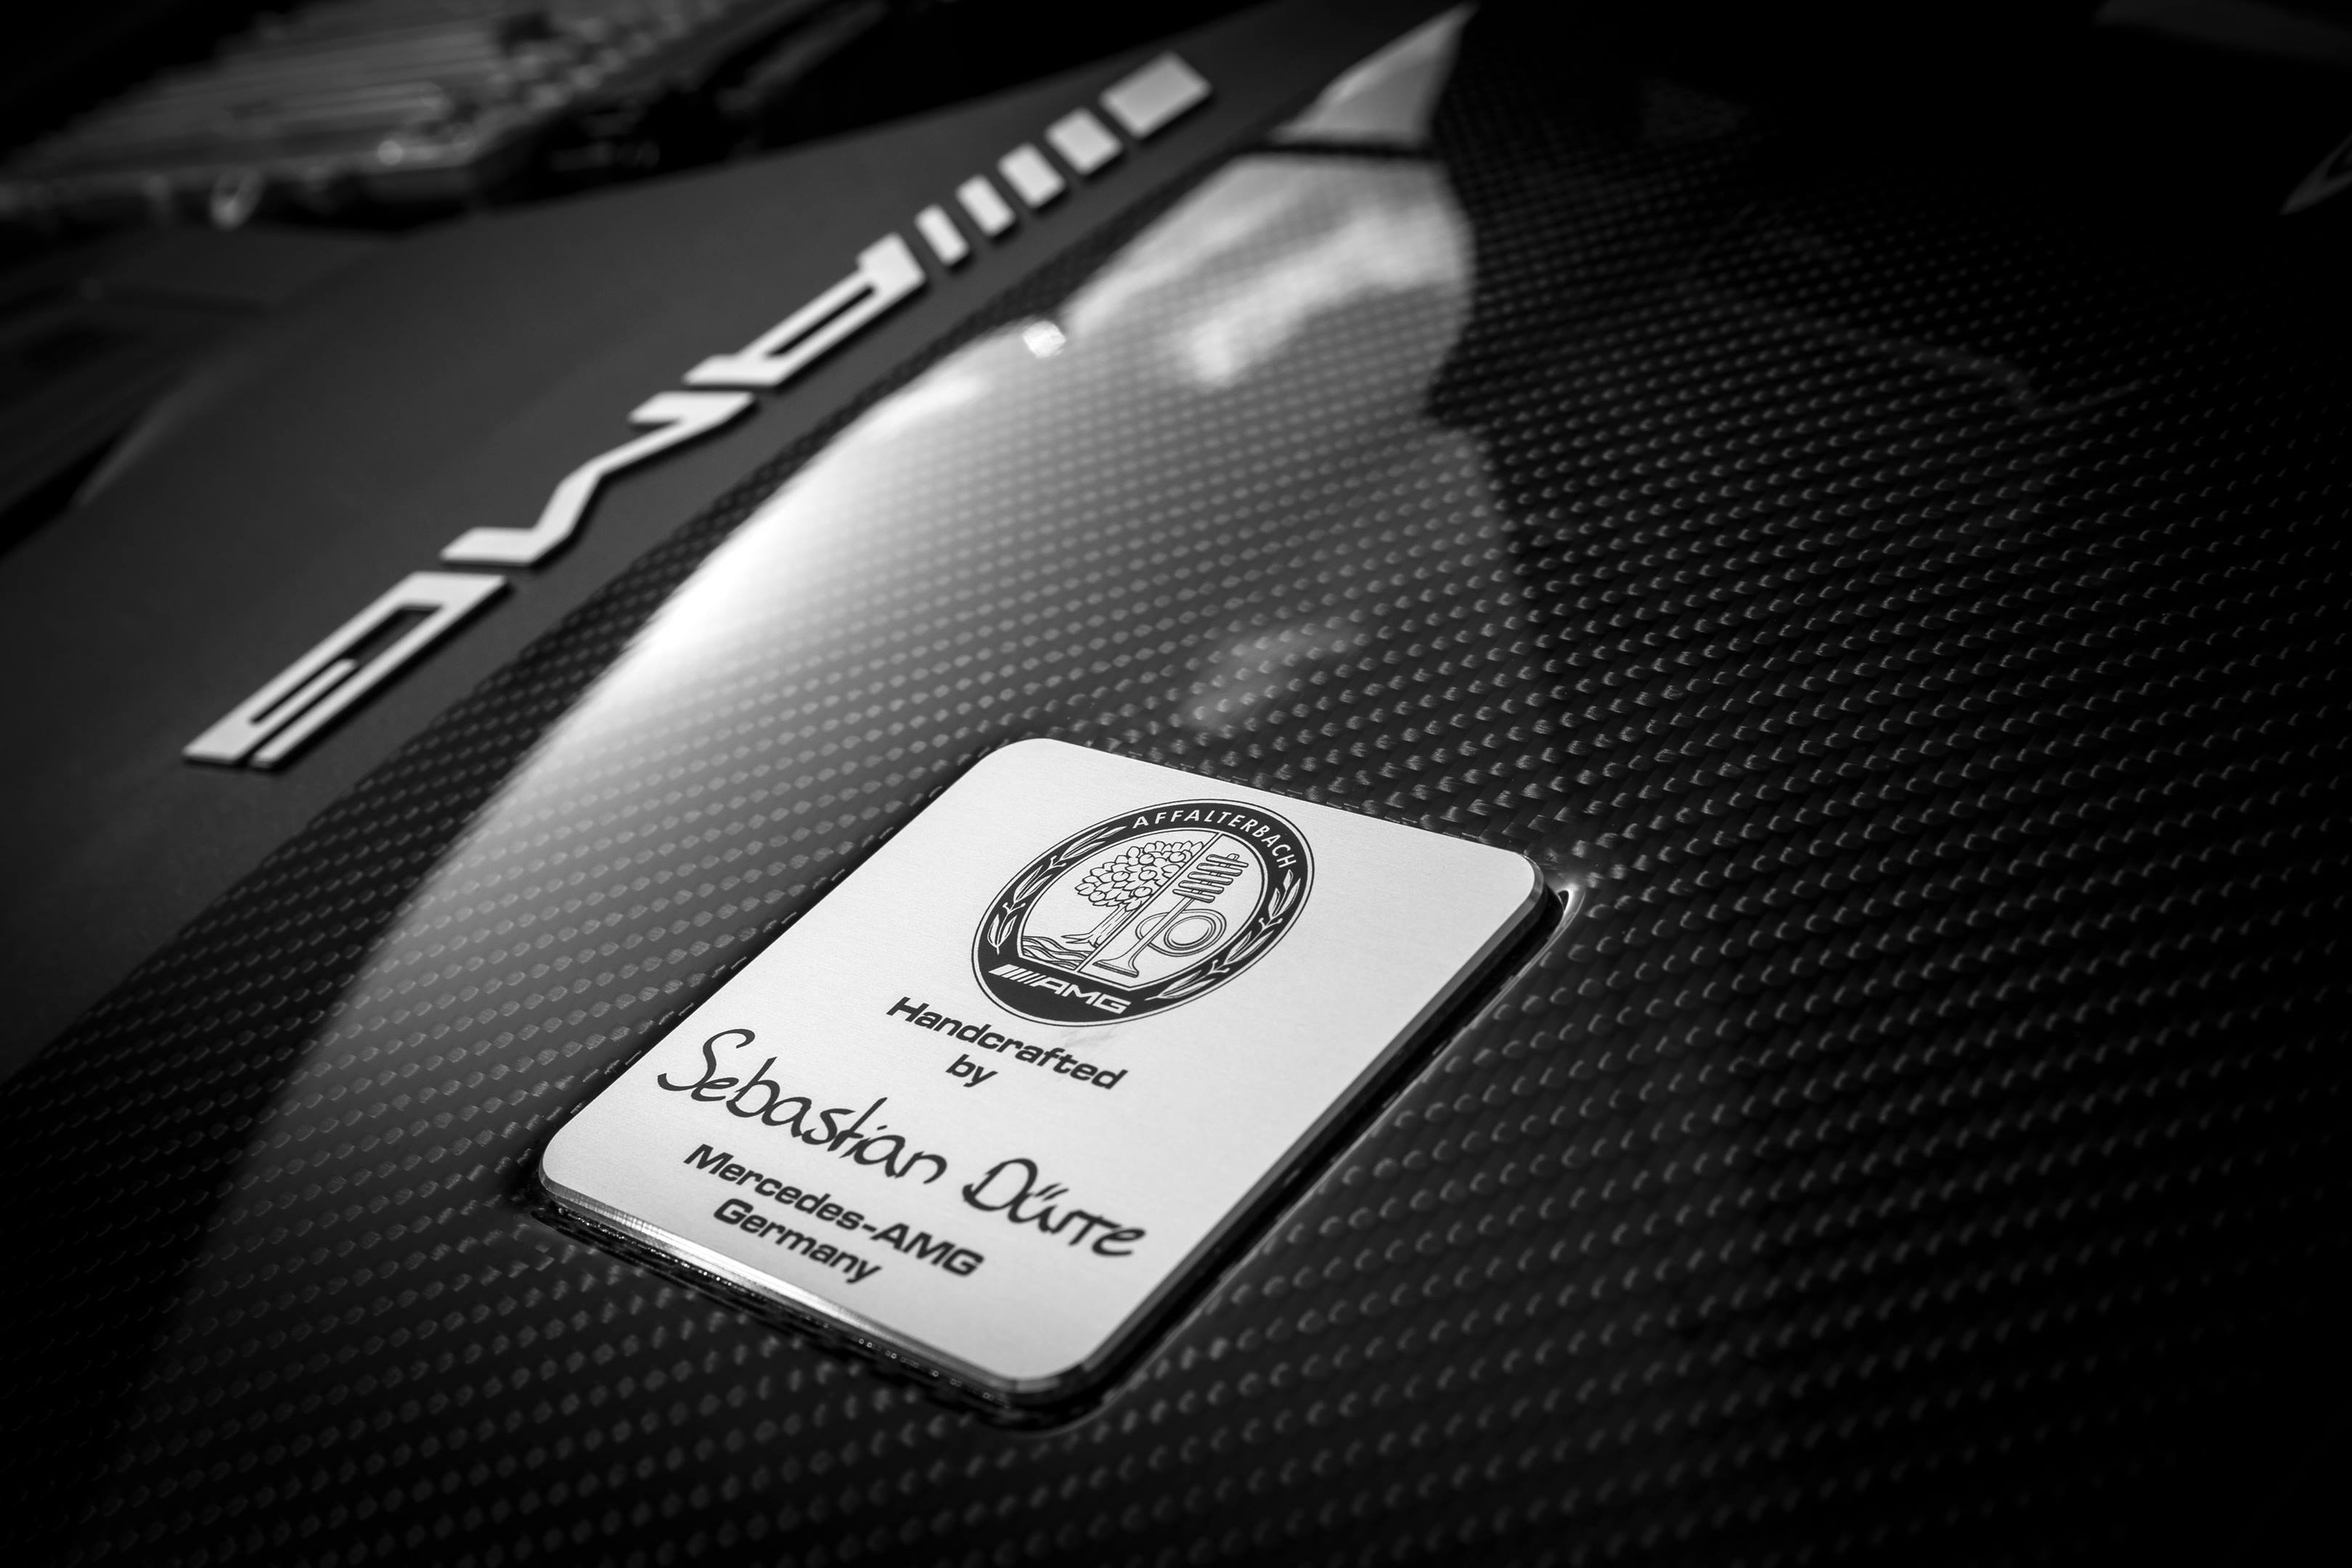 2018 Mercedes-AMG GT R engine badge